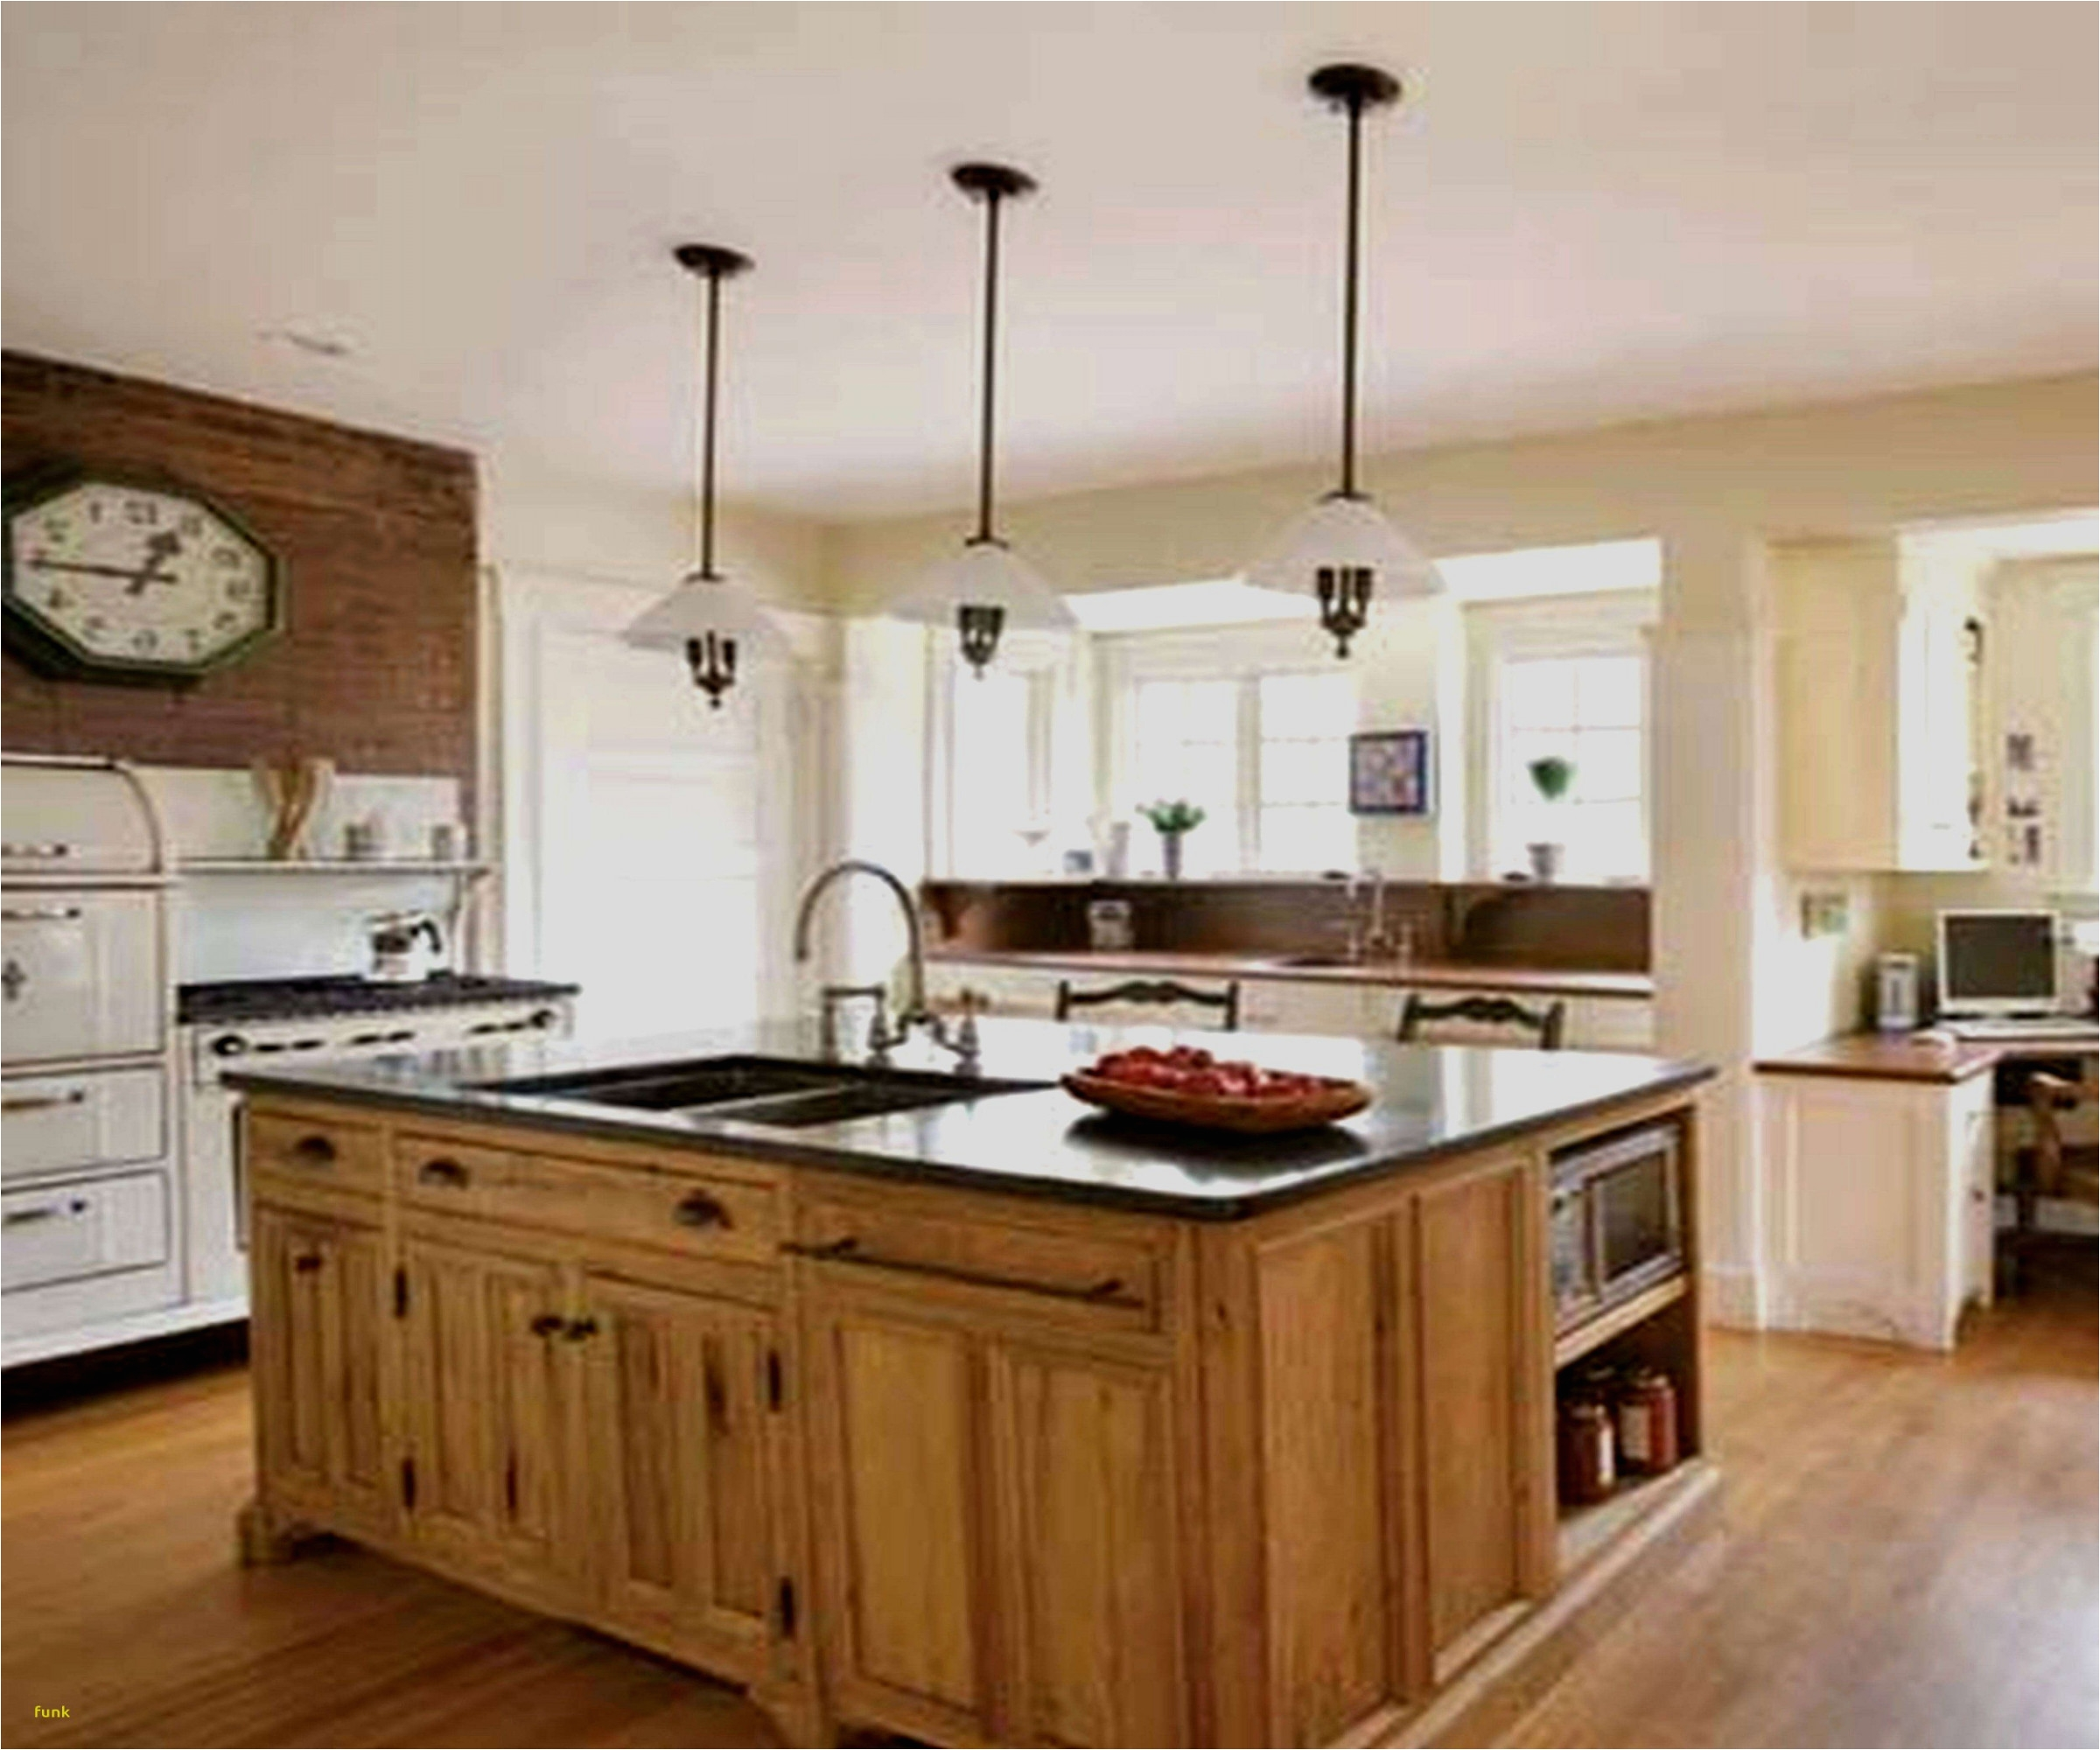 Kitchen Kitchen Designing Kitchen Designing 0d' Kitchens Scheme Design Ideas Small Kitchen Pantry Ideas